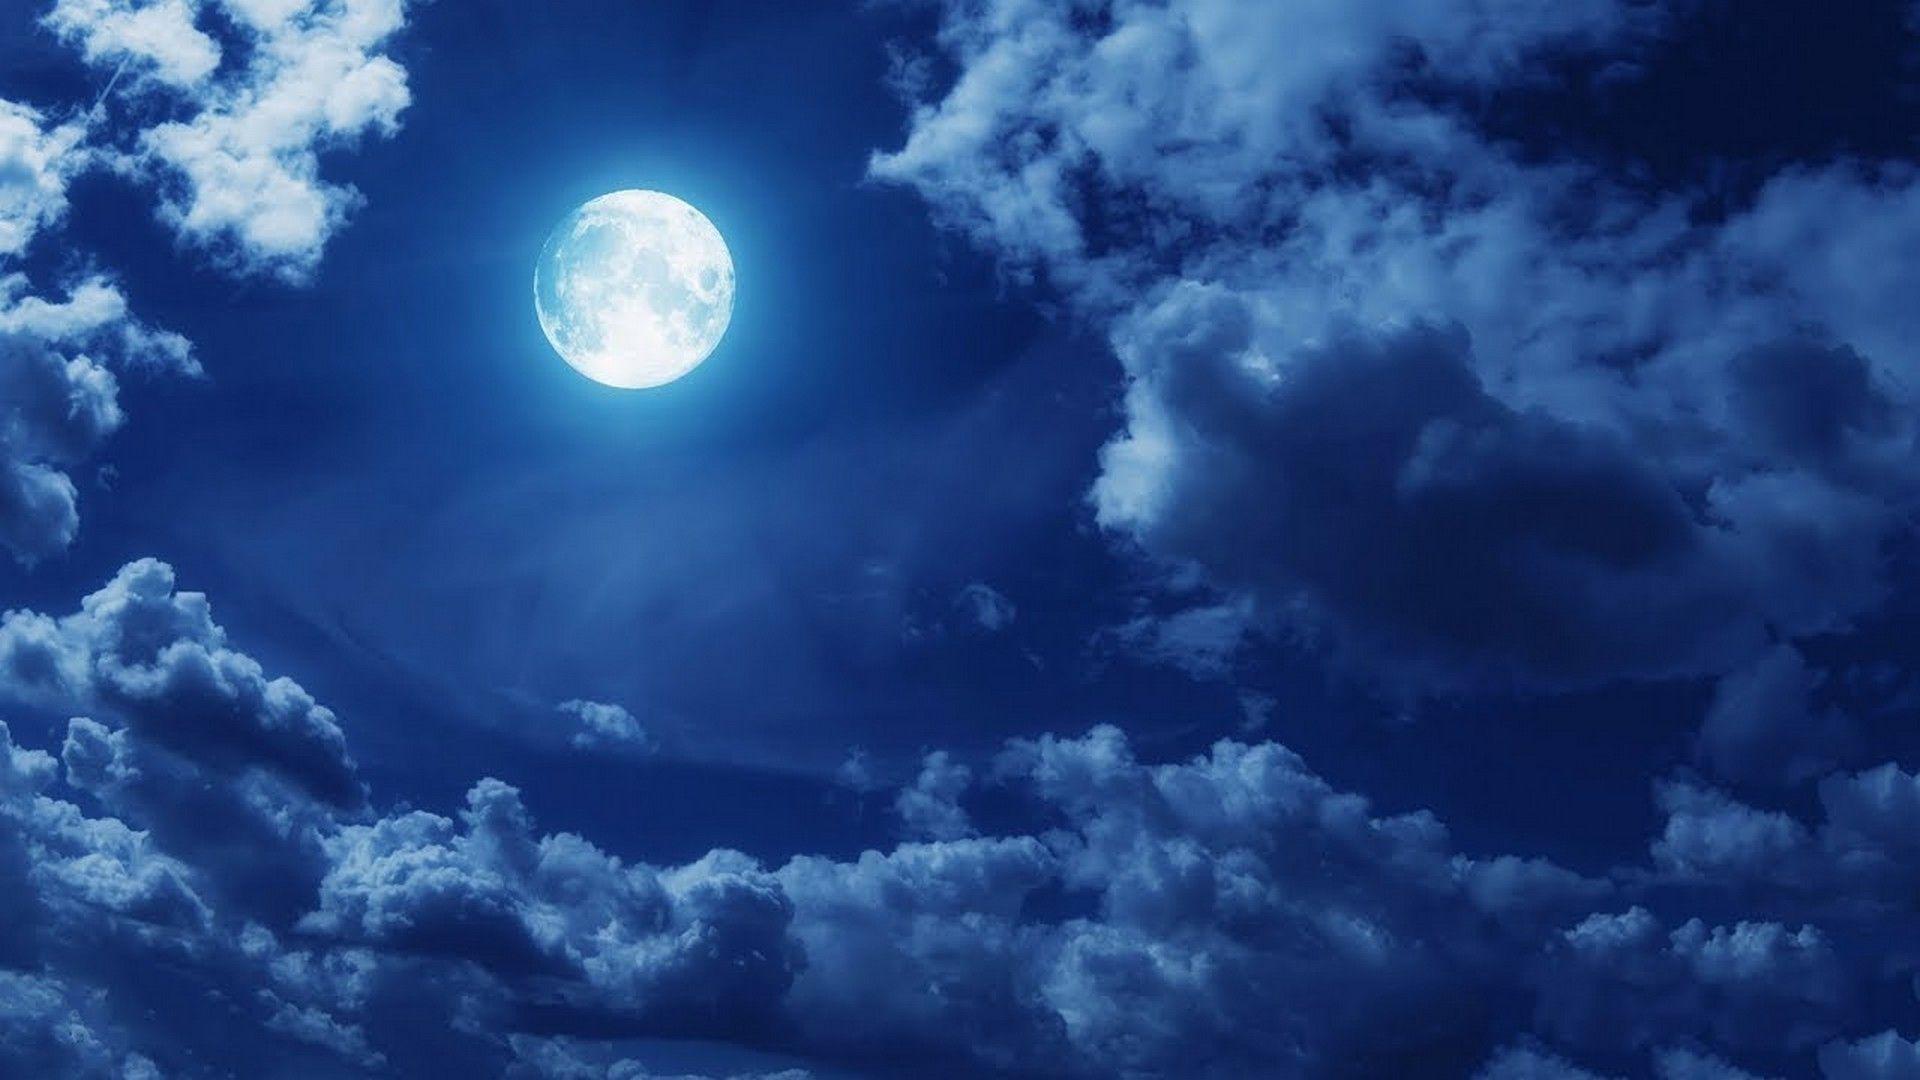 Hd Wallpaper Super Moon Best Hd Wallpapers Moon Clouds Clouds Night Sky Moon